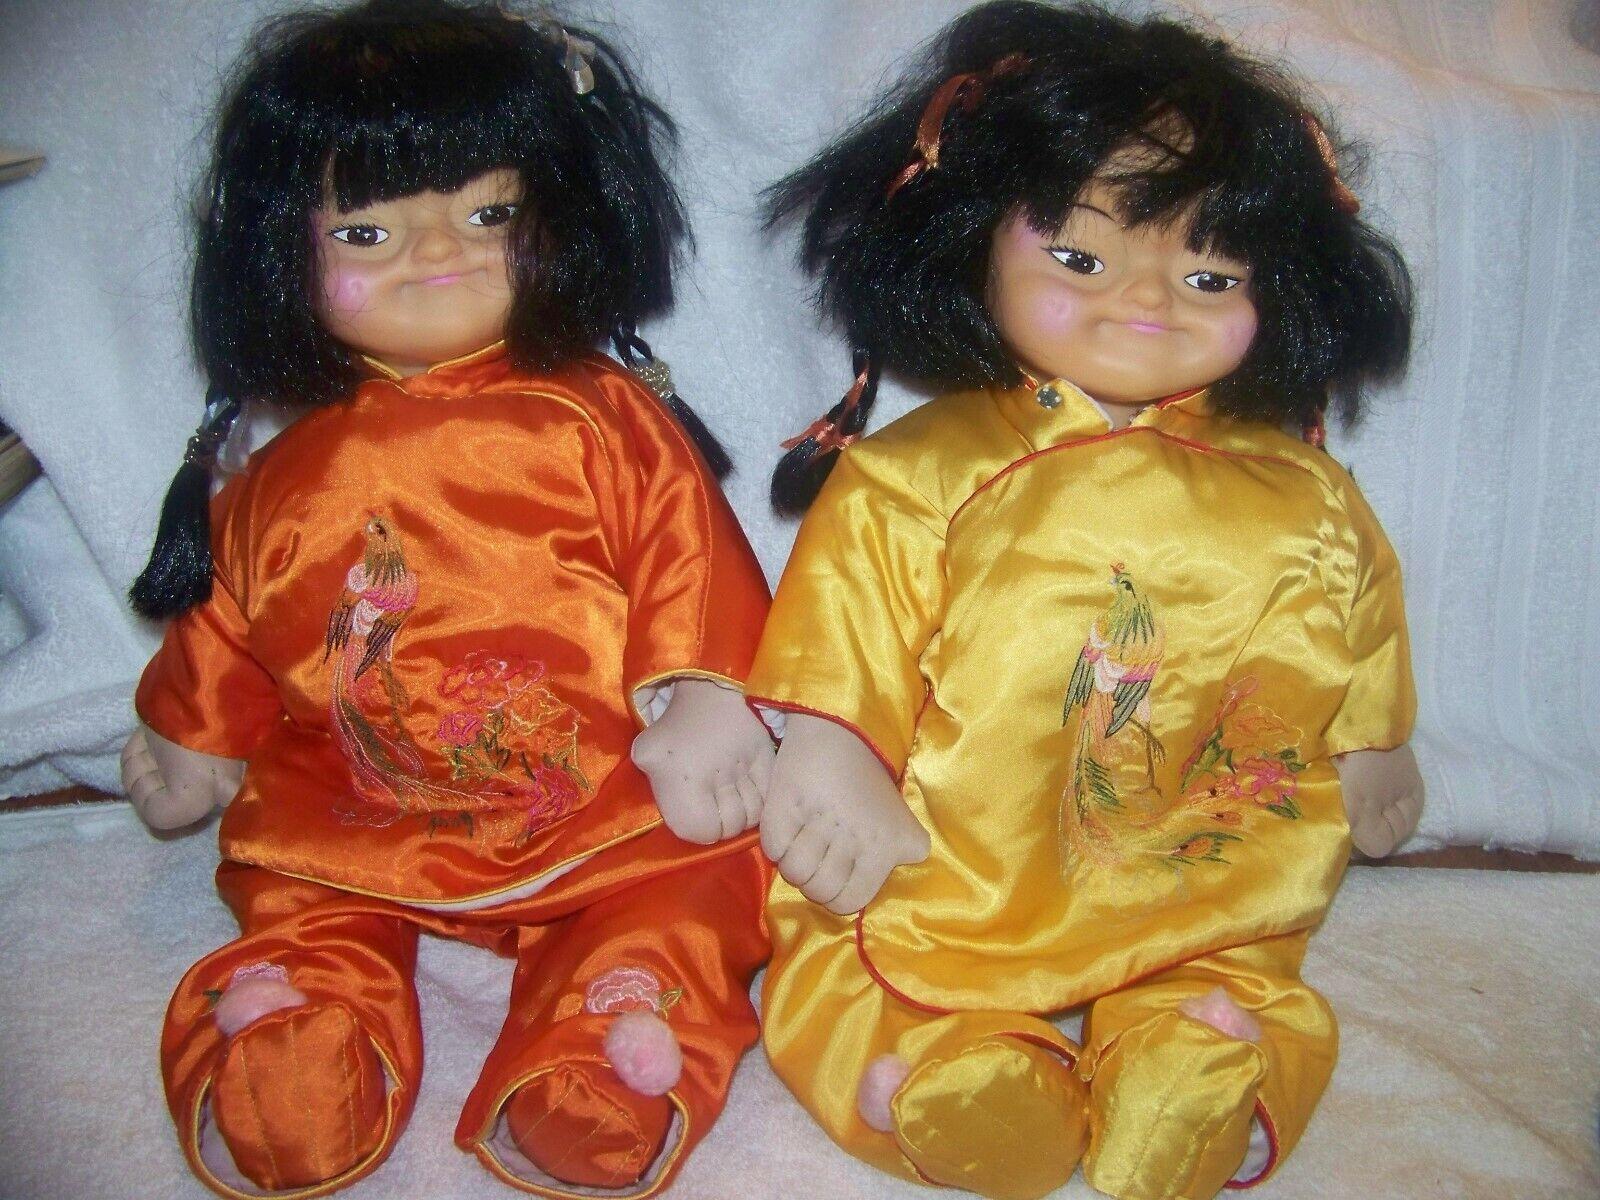 Pair Girl 21 Chau Yeung Dolls Hong Kong, traditional clothing braided pig tails